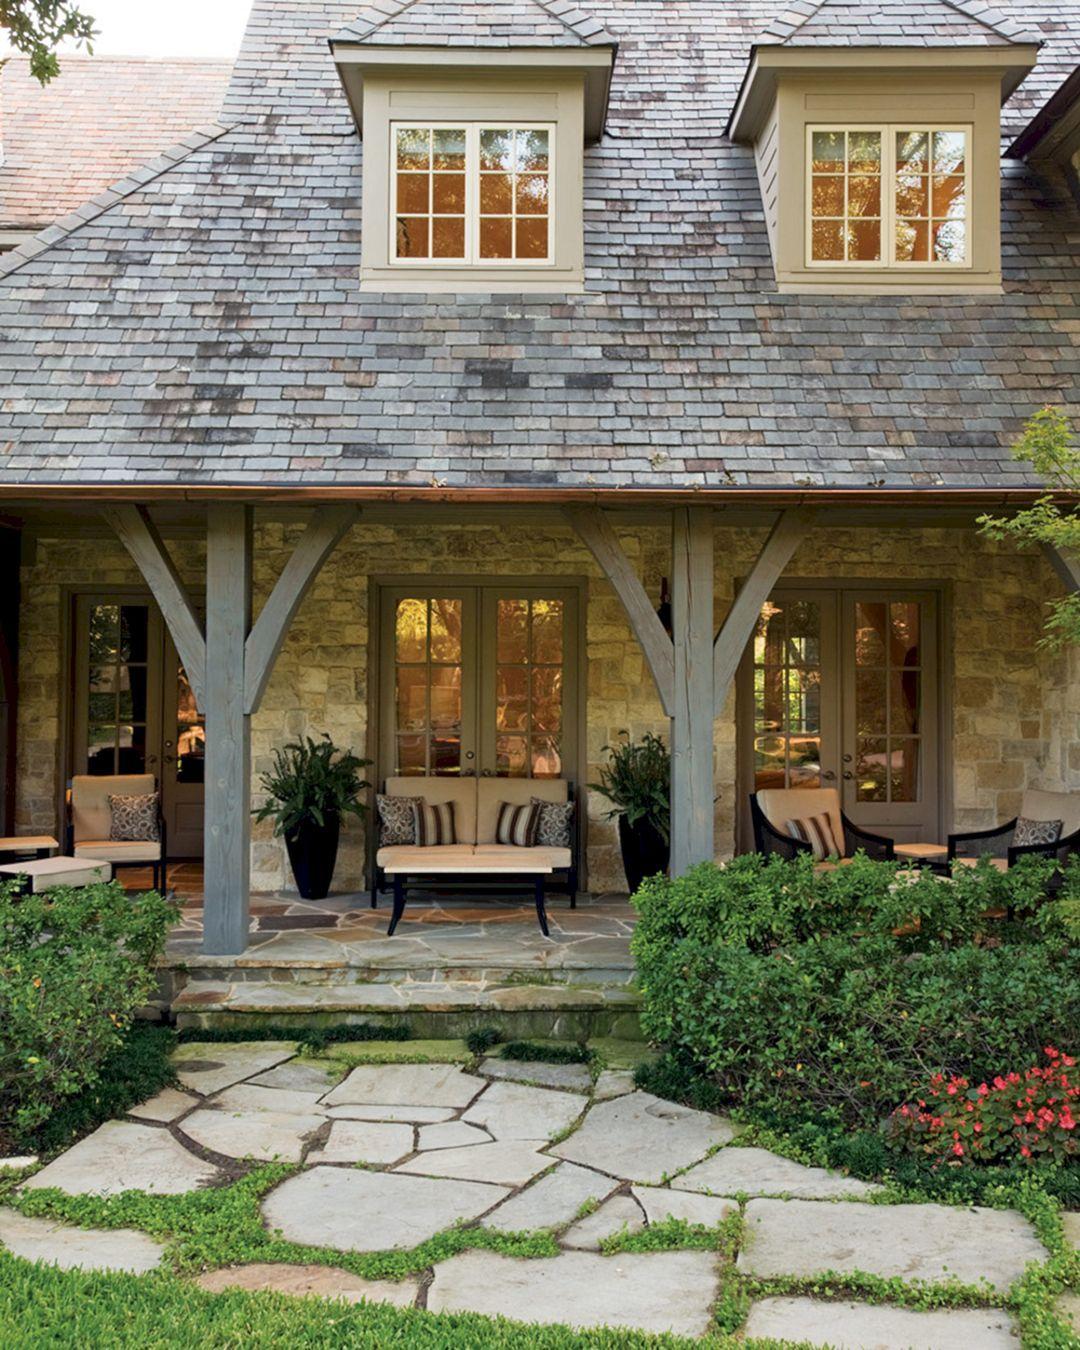 Top 5 Elegant French Country Home Architecture Ideas Freshouz Com Modern Farmhouse Exterior French Country House House Exterior